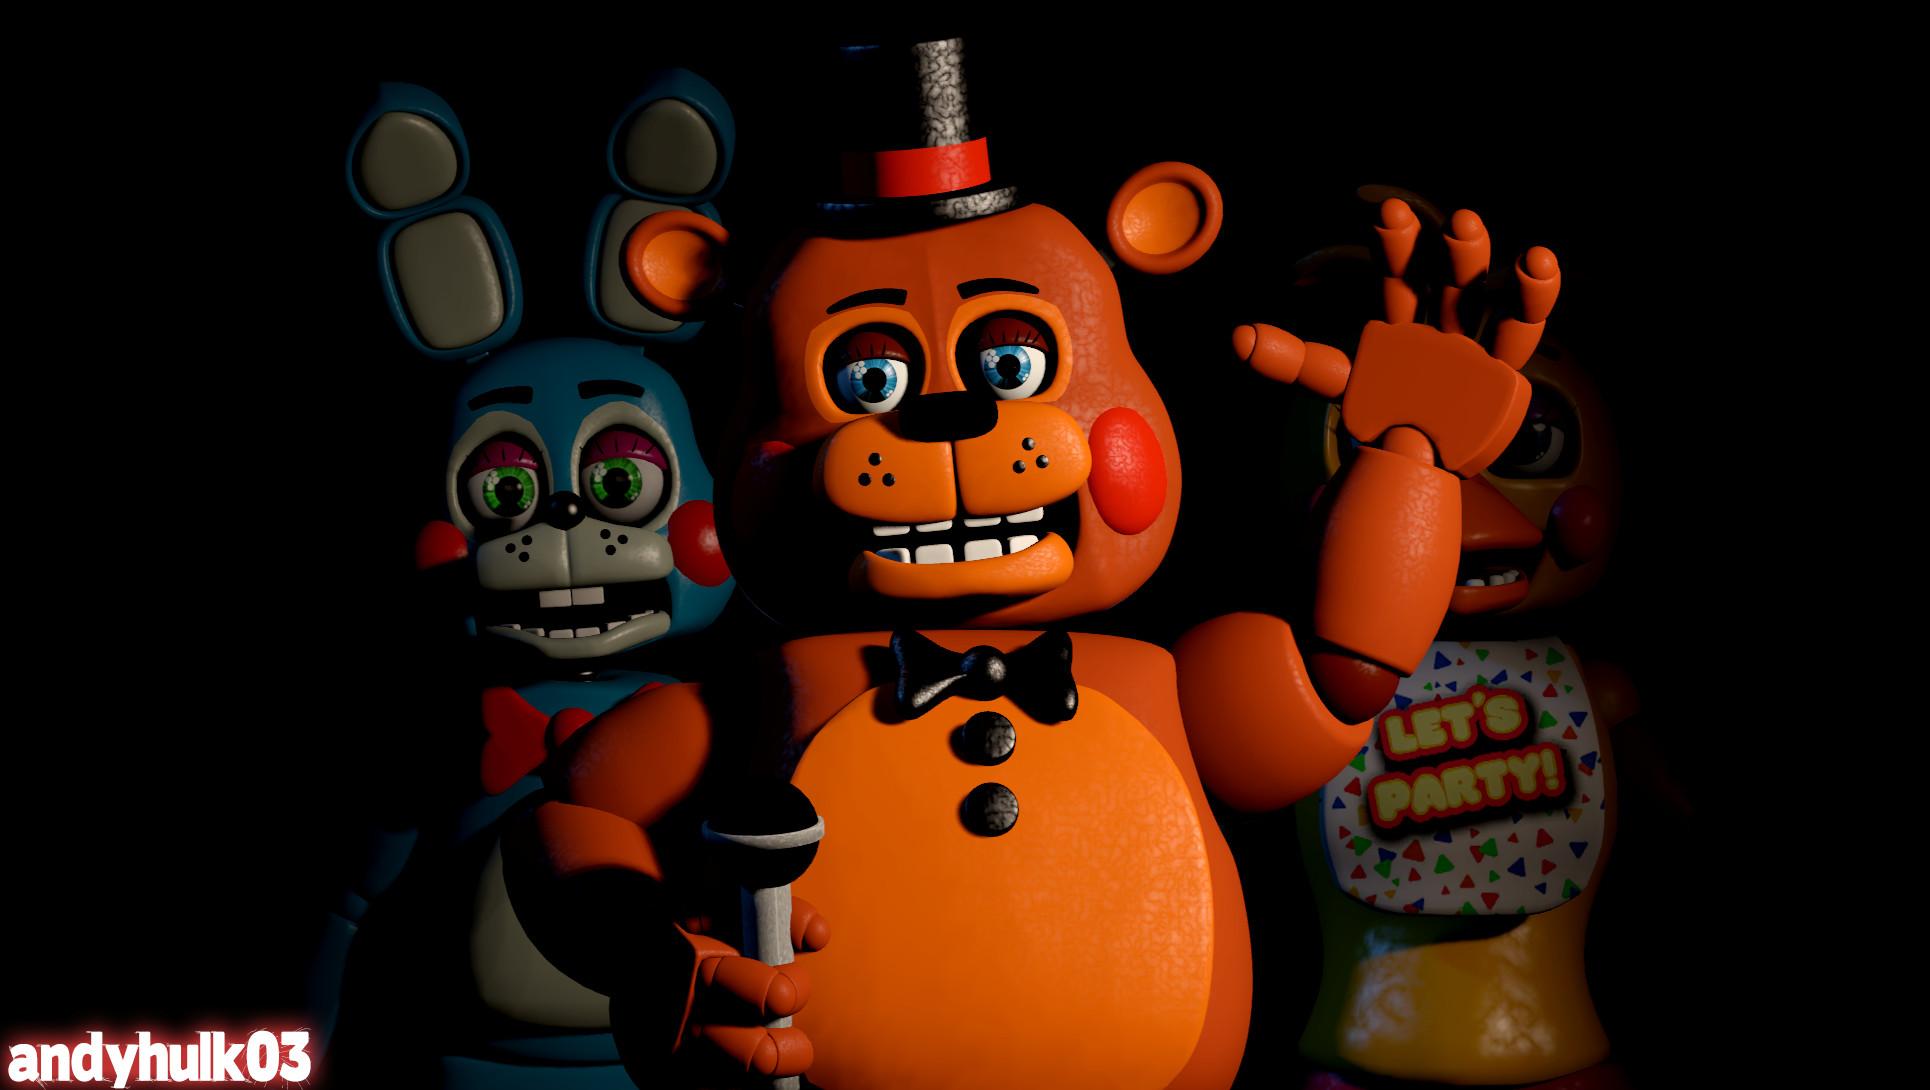 Fnaf 2 Toy Freddy Fnaf Desktop Wallpaper...